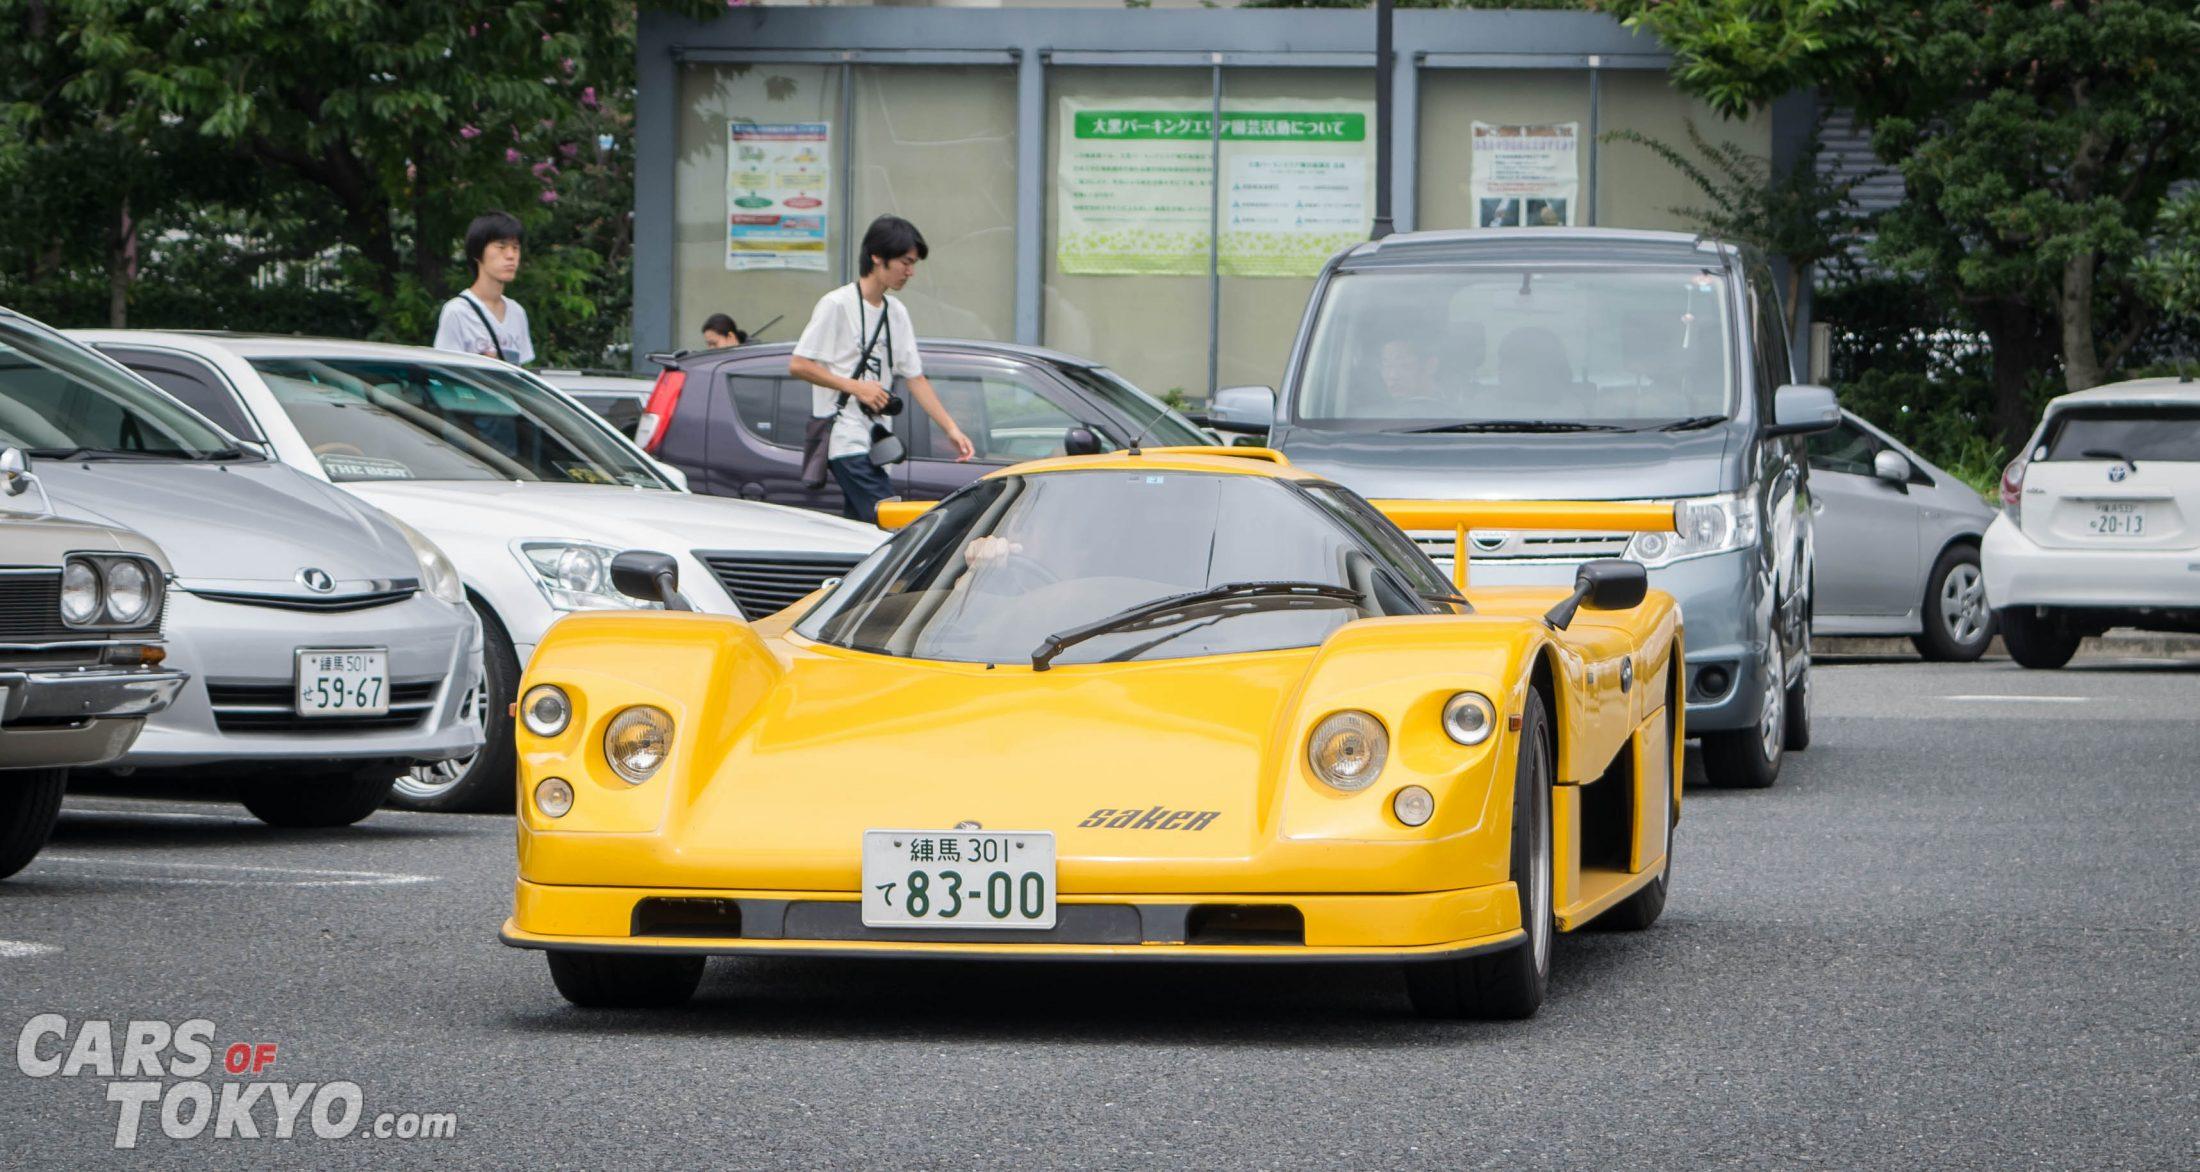 cars-of-tokyo-daikoku-saker